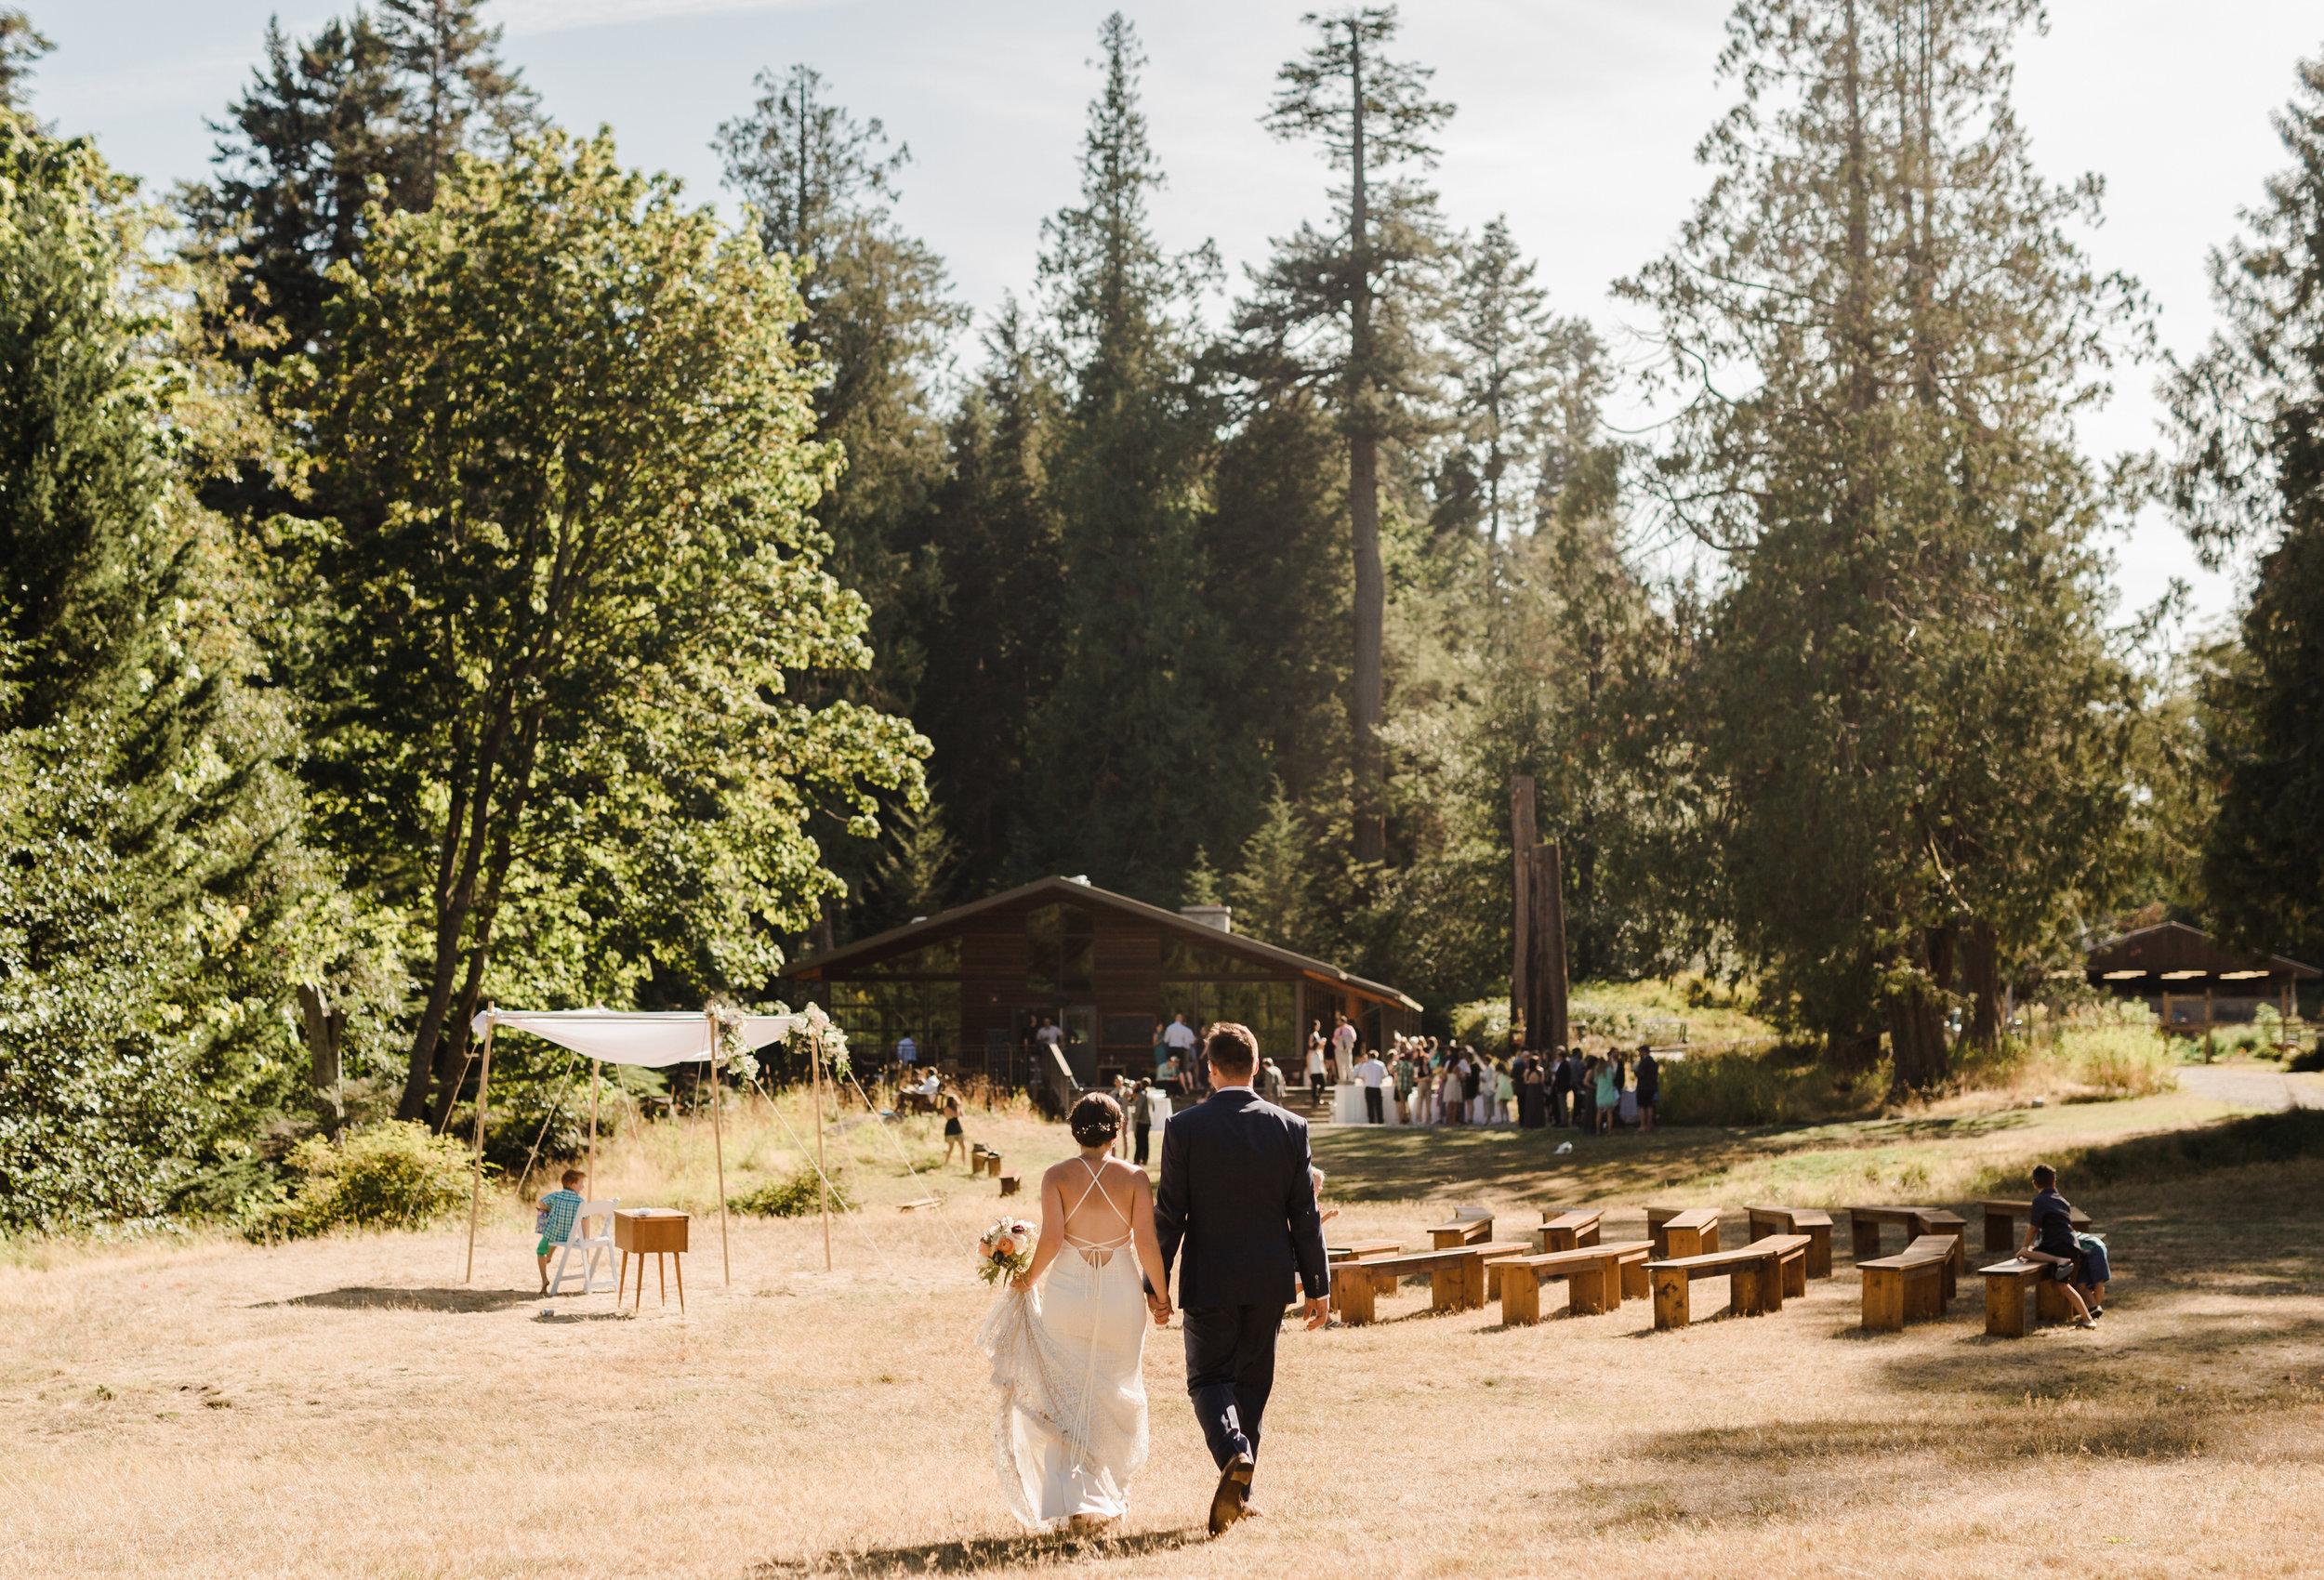 Camp Fircom Wedding - Vancouver Wedding Photographer & Videographer - Sunshine Coast Wedding Photos - Sunshine Coast Wedding Photographer - Jennifer Picard Photography - IMG_2193.jpg